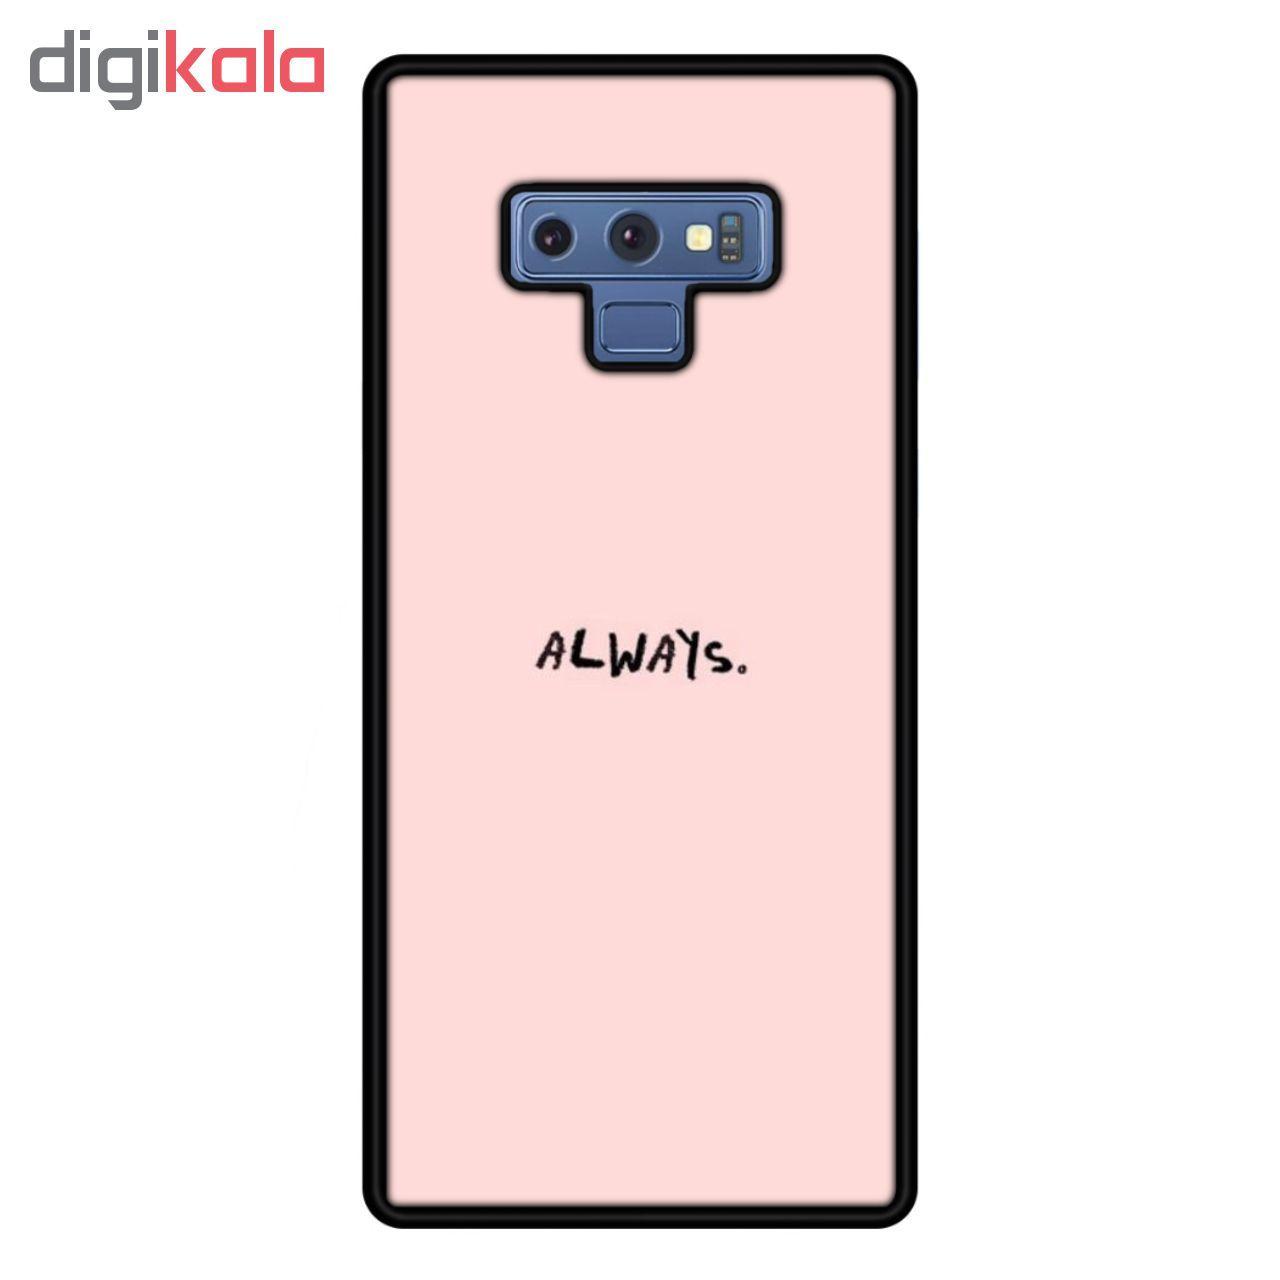 کاور آکام مدل AN90967 مناسب برای گوشی موبایل سامسونگ Galaxy Note 9 main 1 1